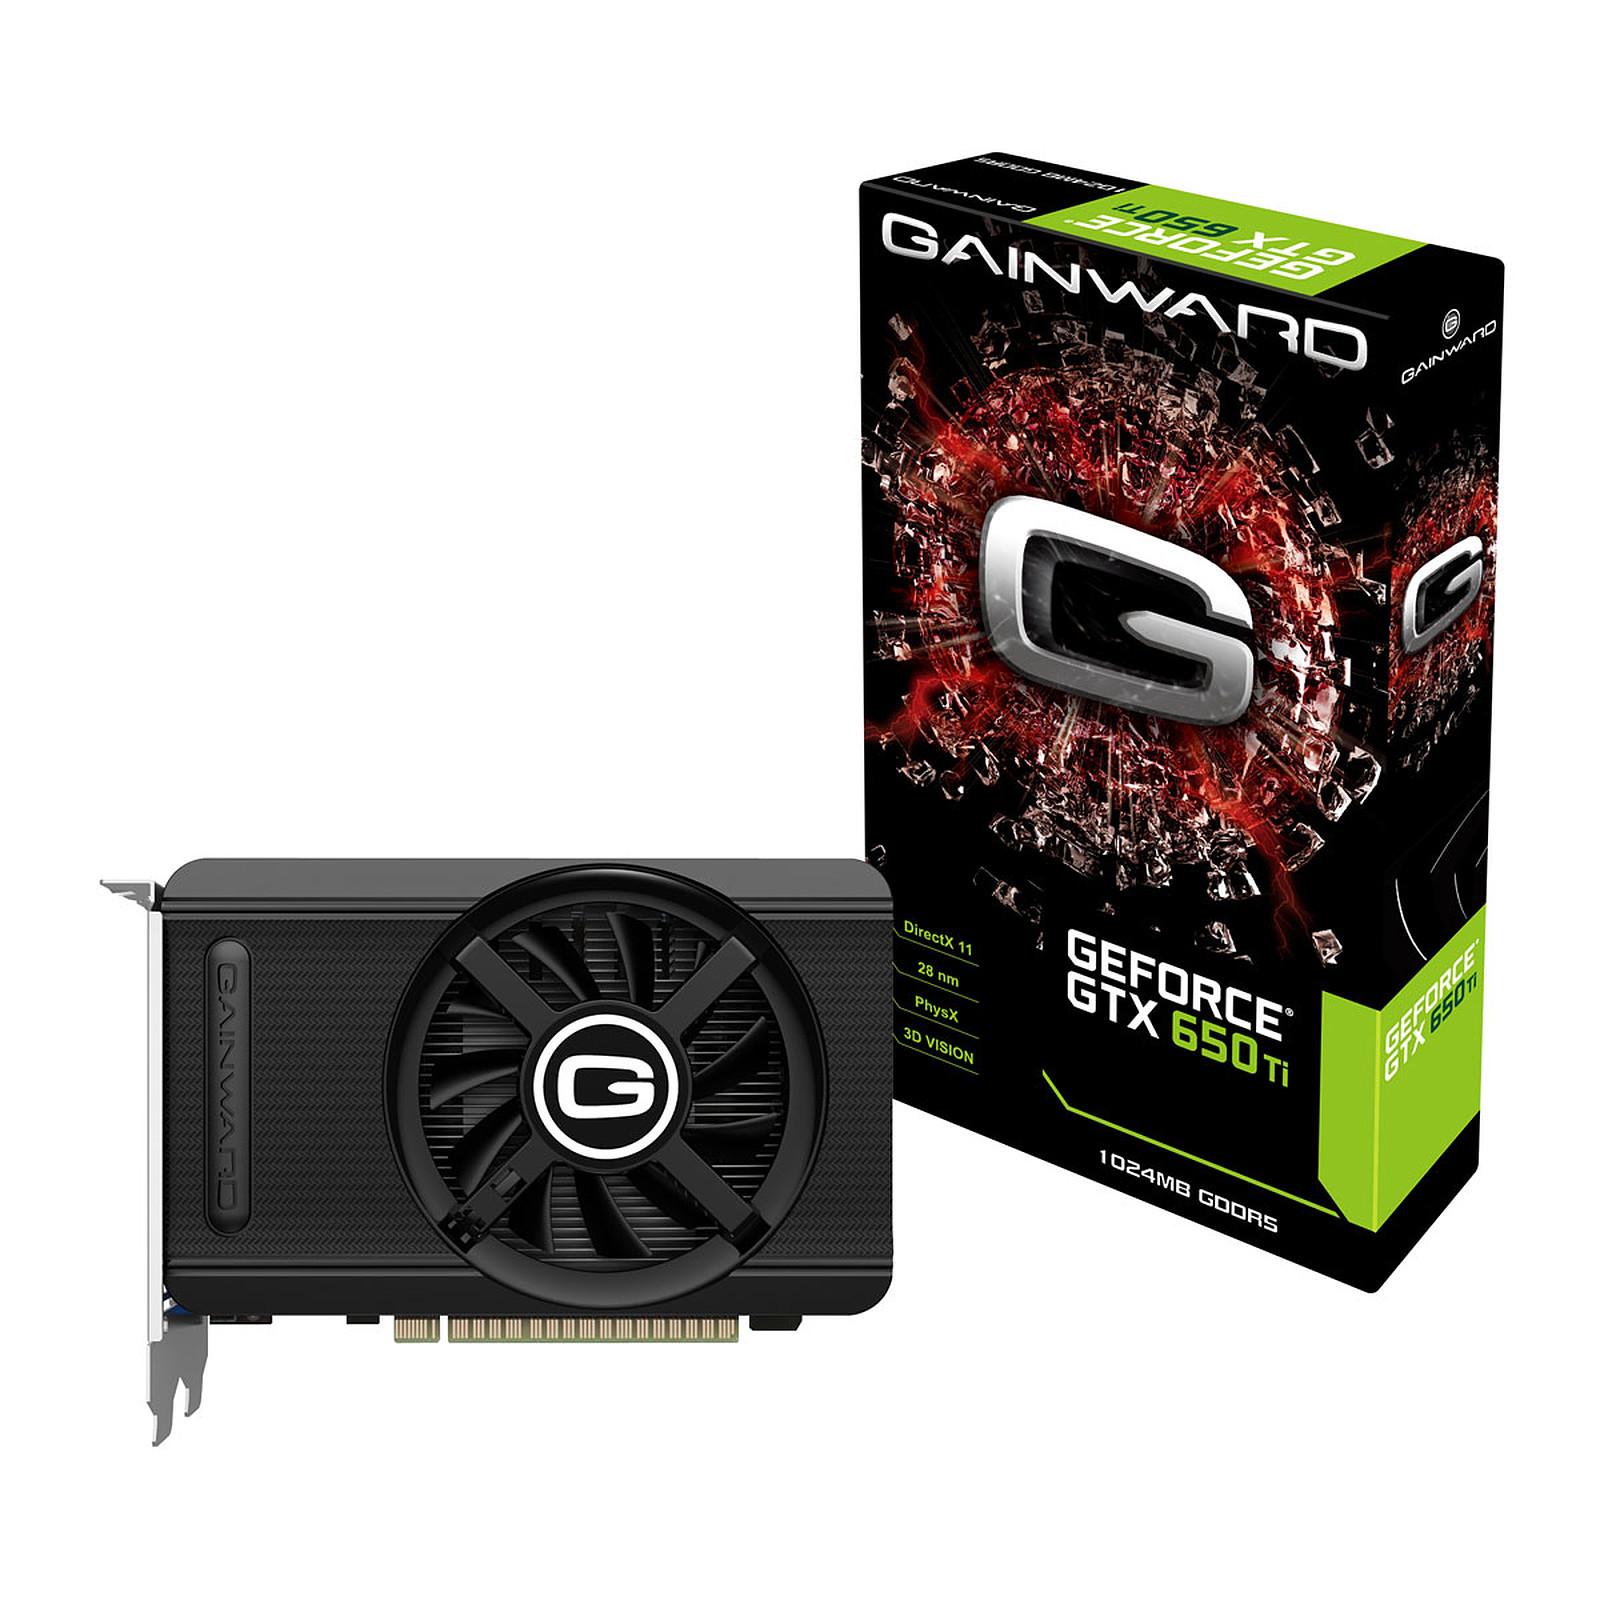 Gainward GeForce GTX 650 Ti 1 GB